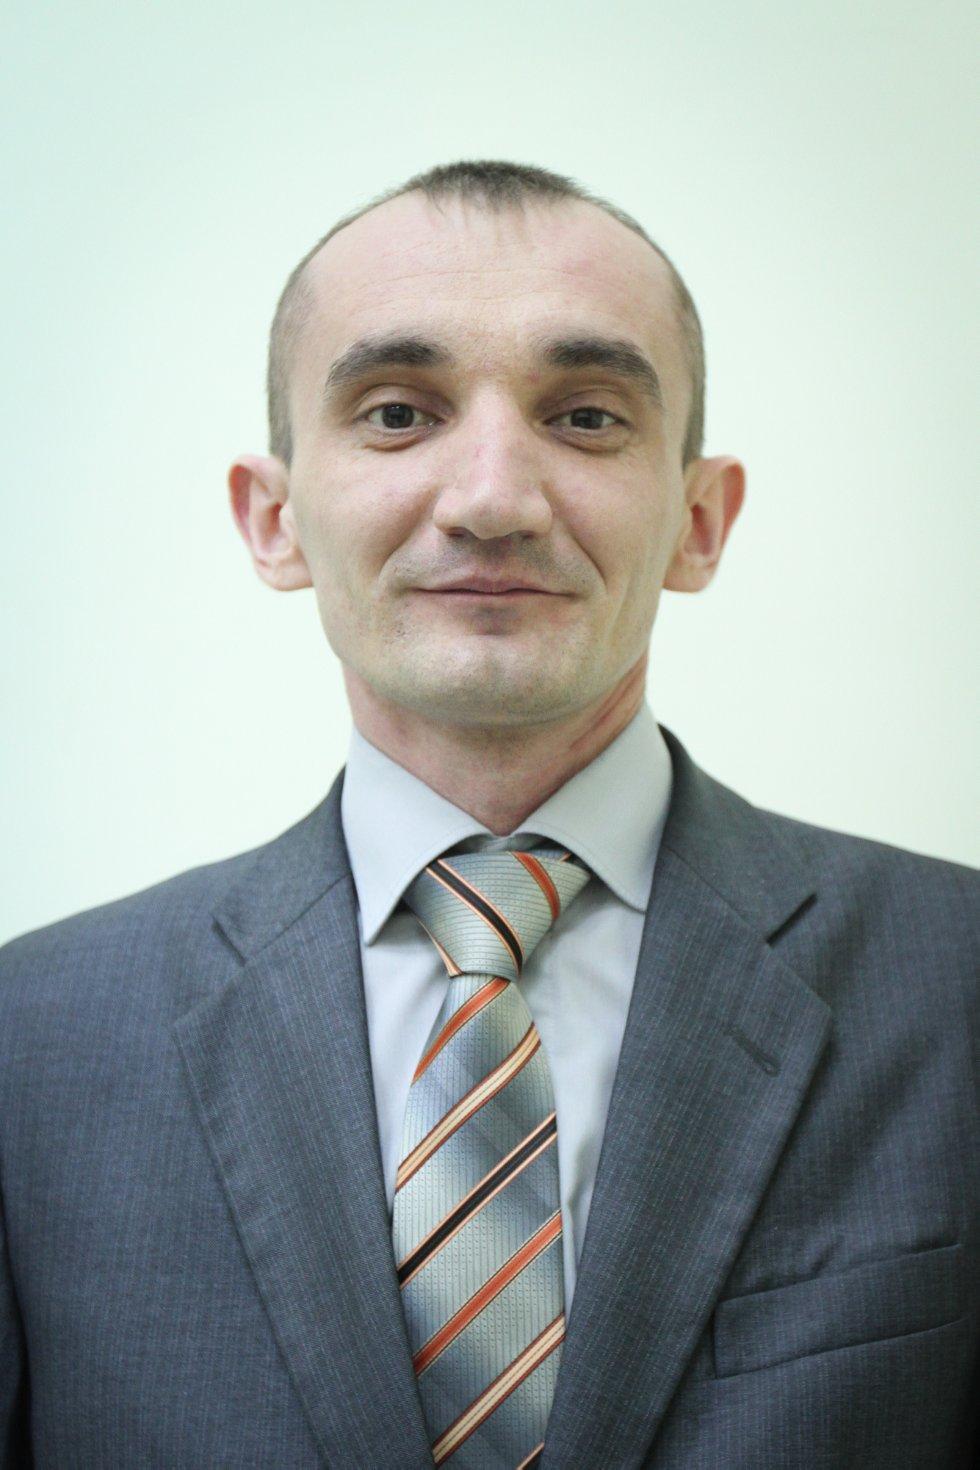 Яруллин Ильнар Фагимович